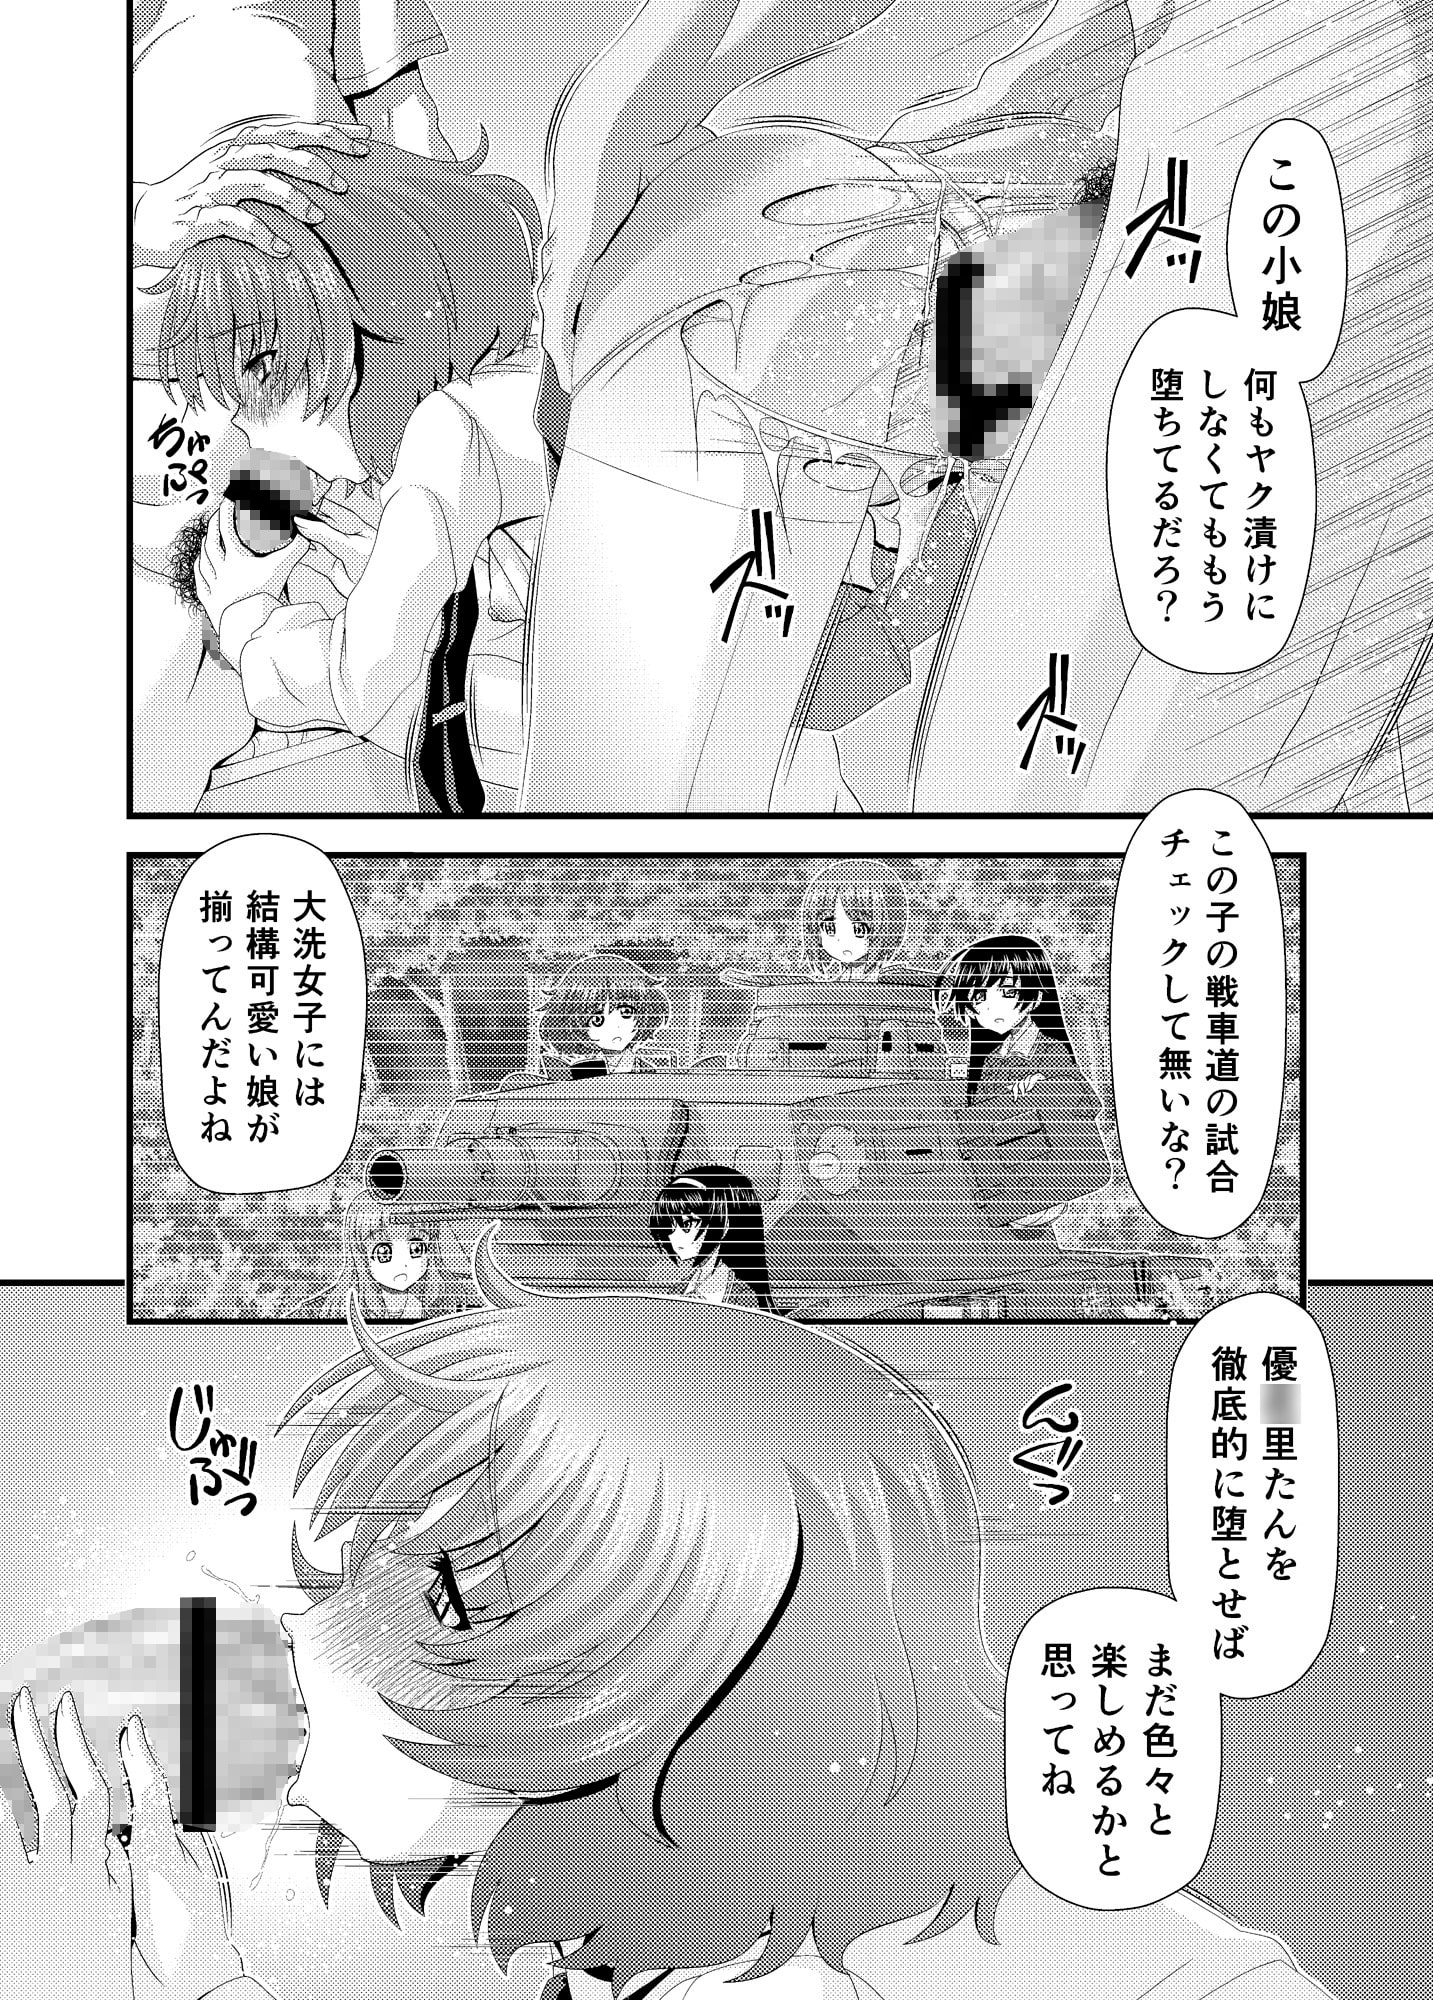 RJ323220 戦車乙女陵辱 壱 秋山優○里編2 [20210406]